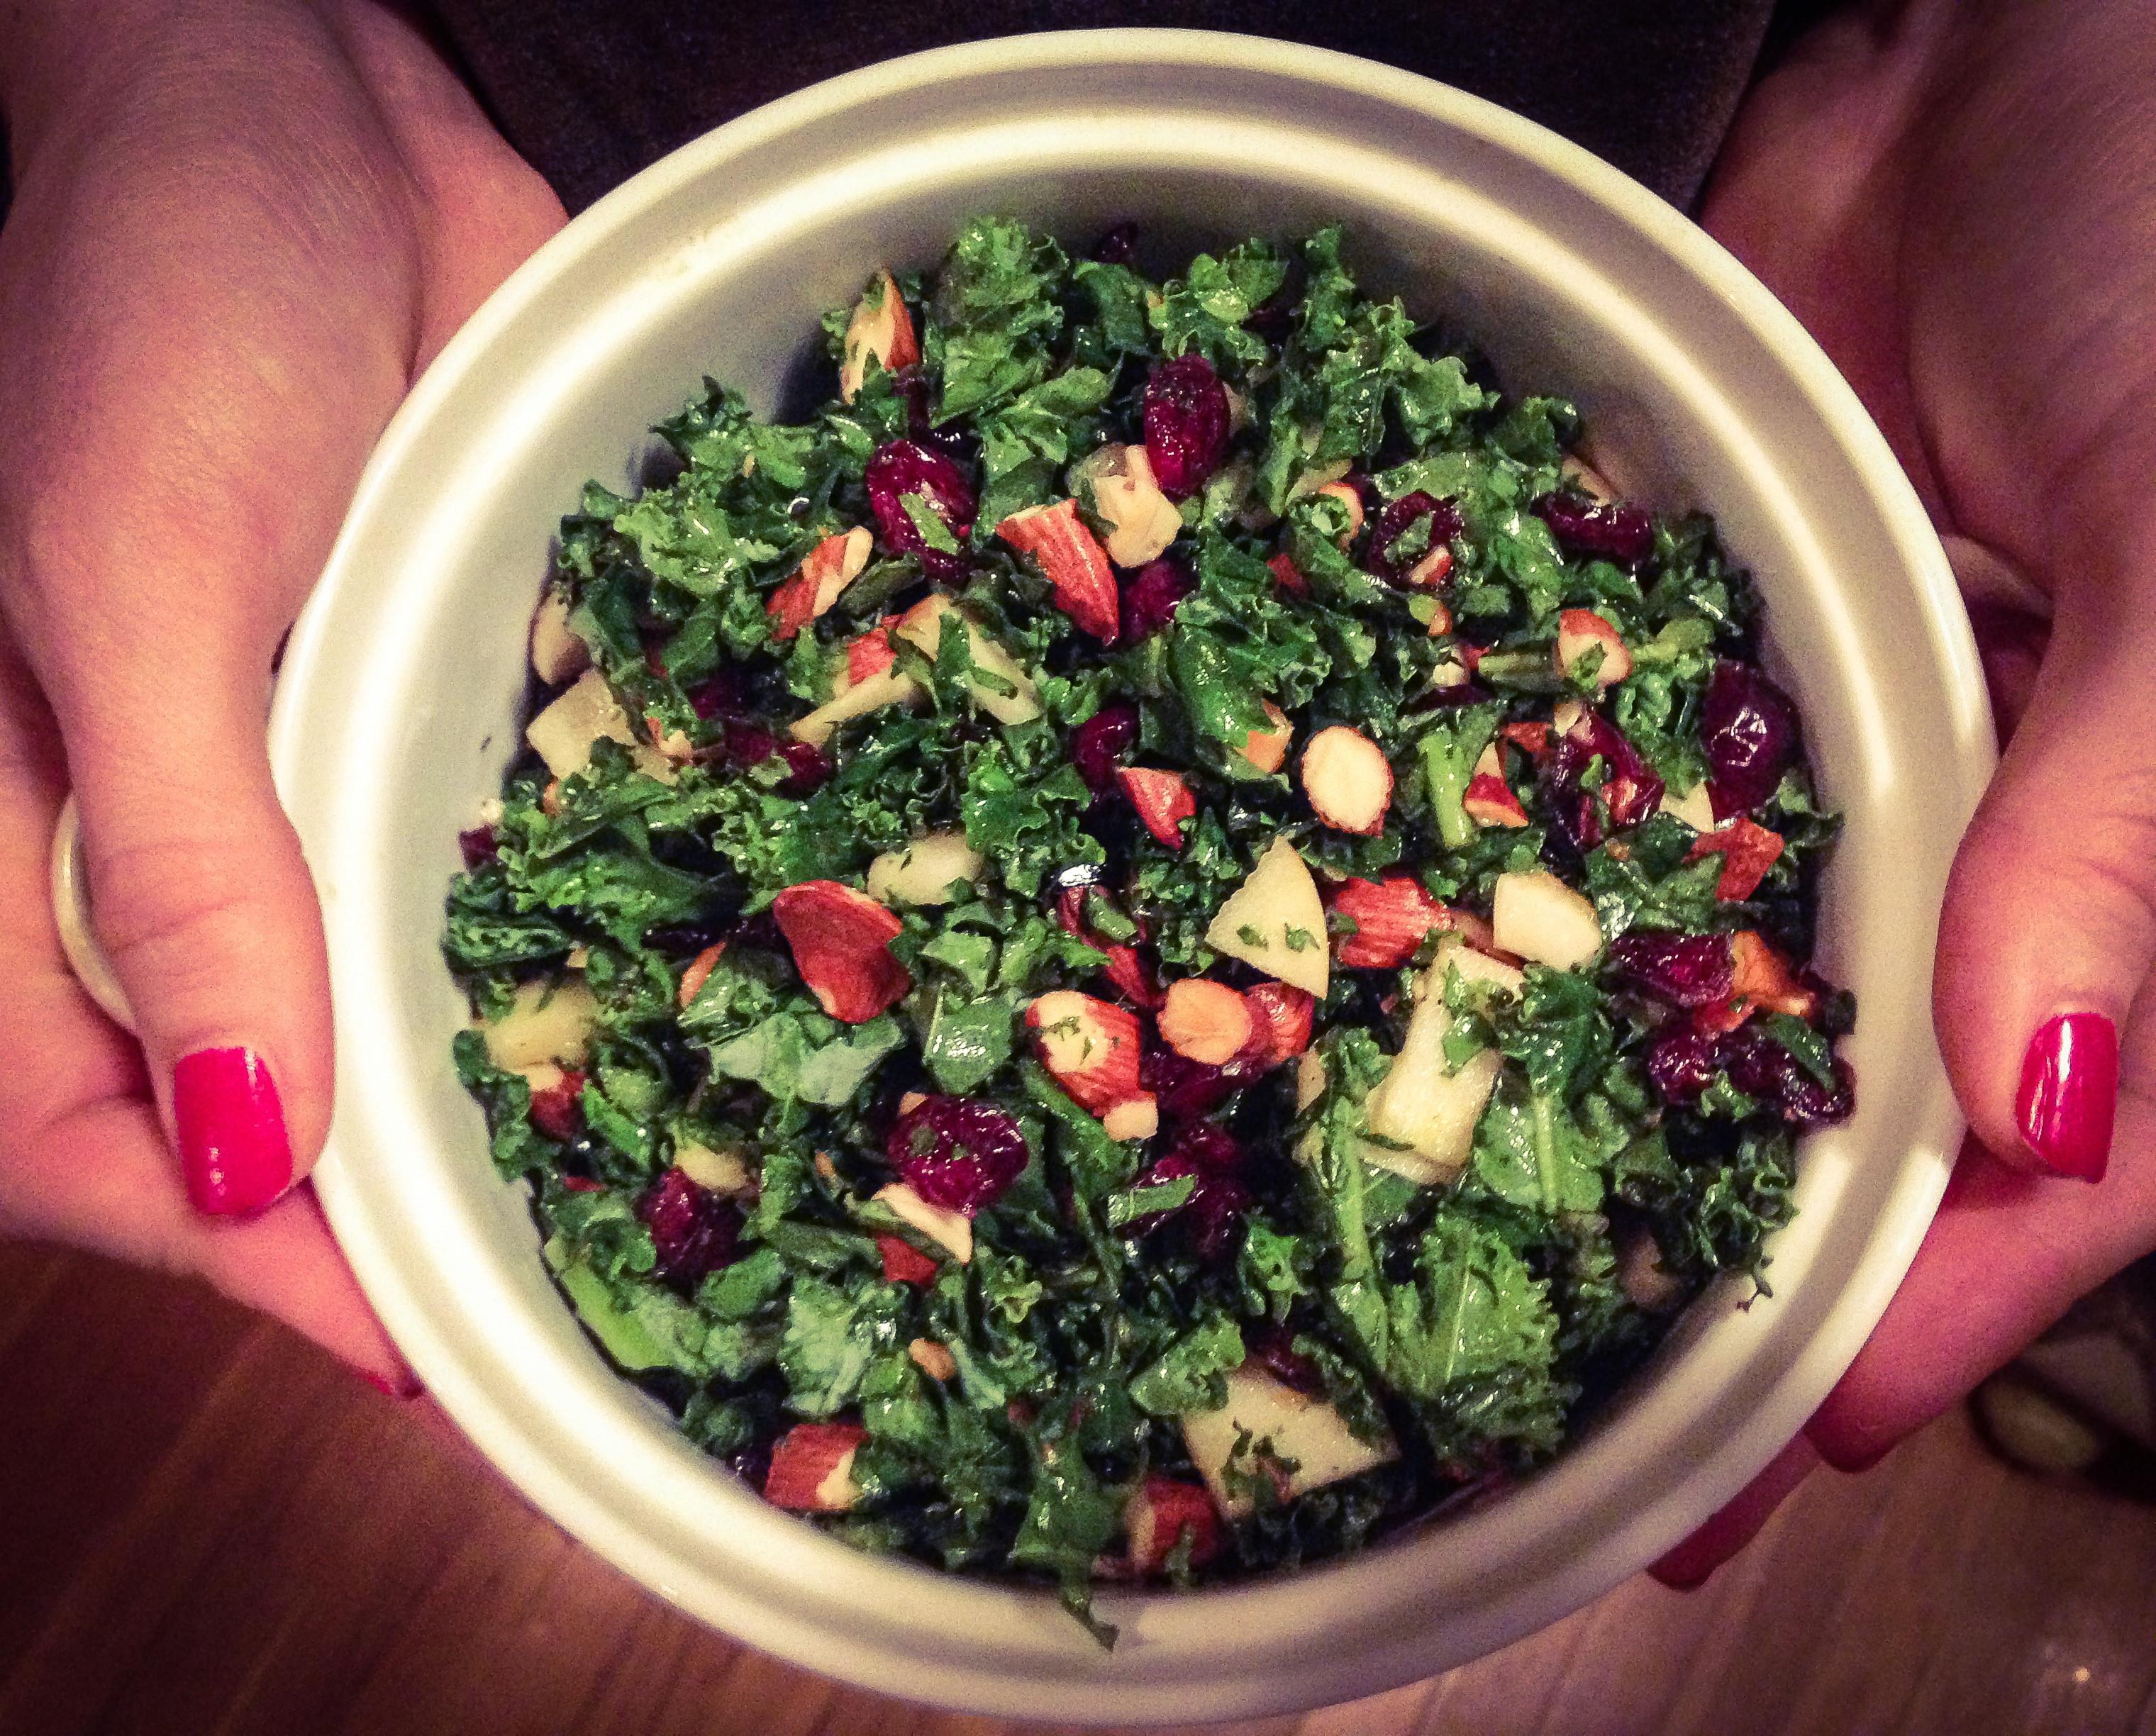 Summer Kale Salad Recipes  Fruit and Nut Summer Kale Salad Recipe Feel good Eat clean